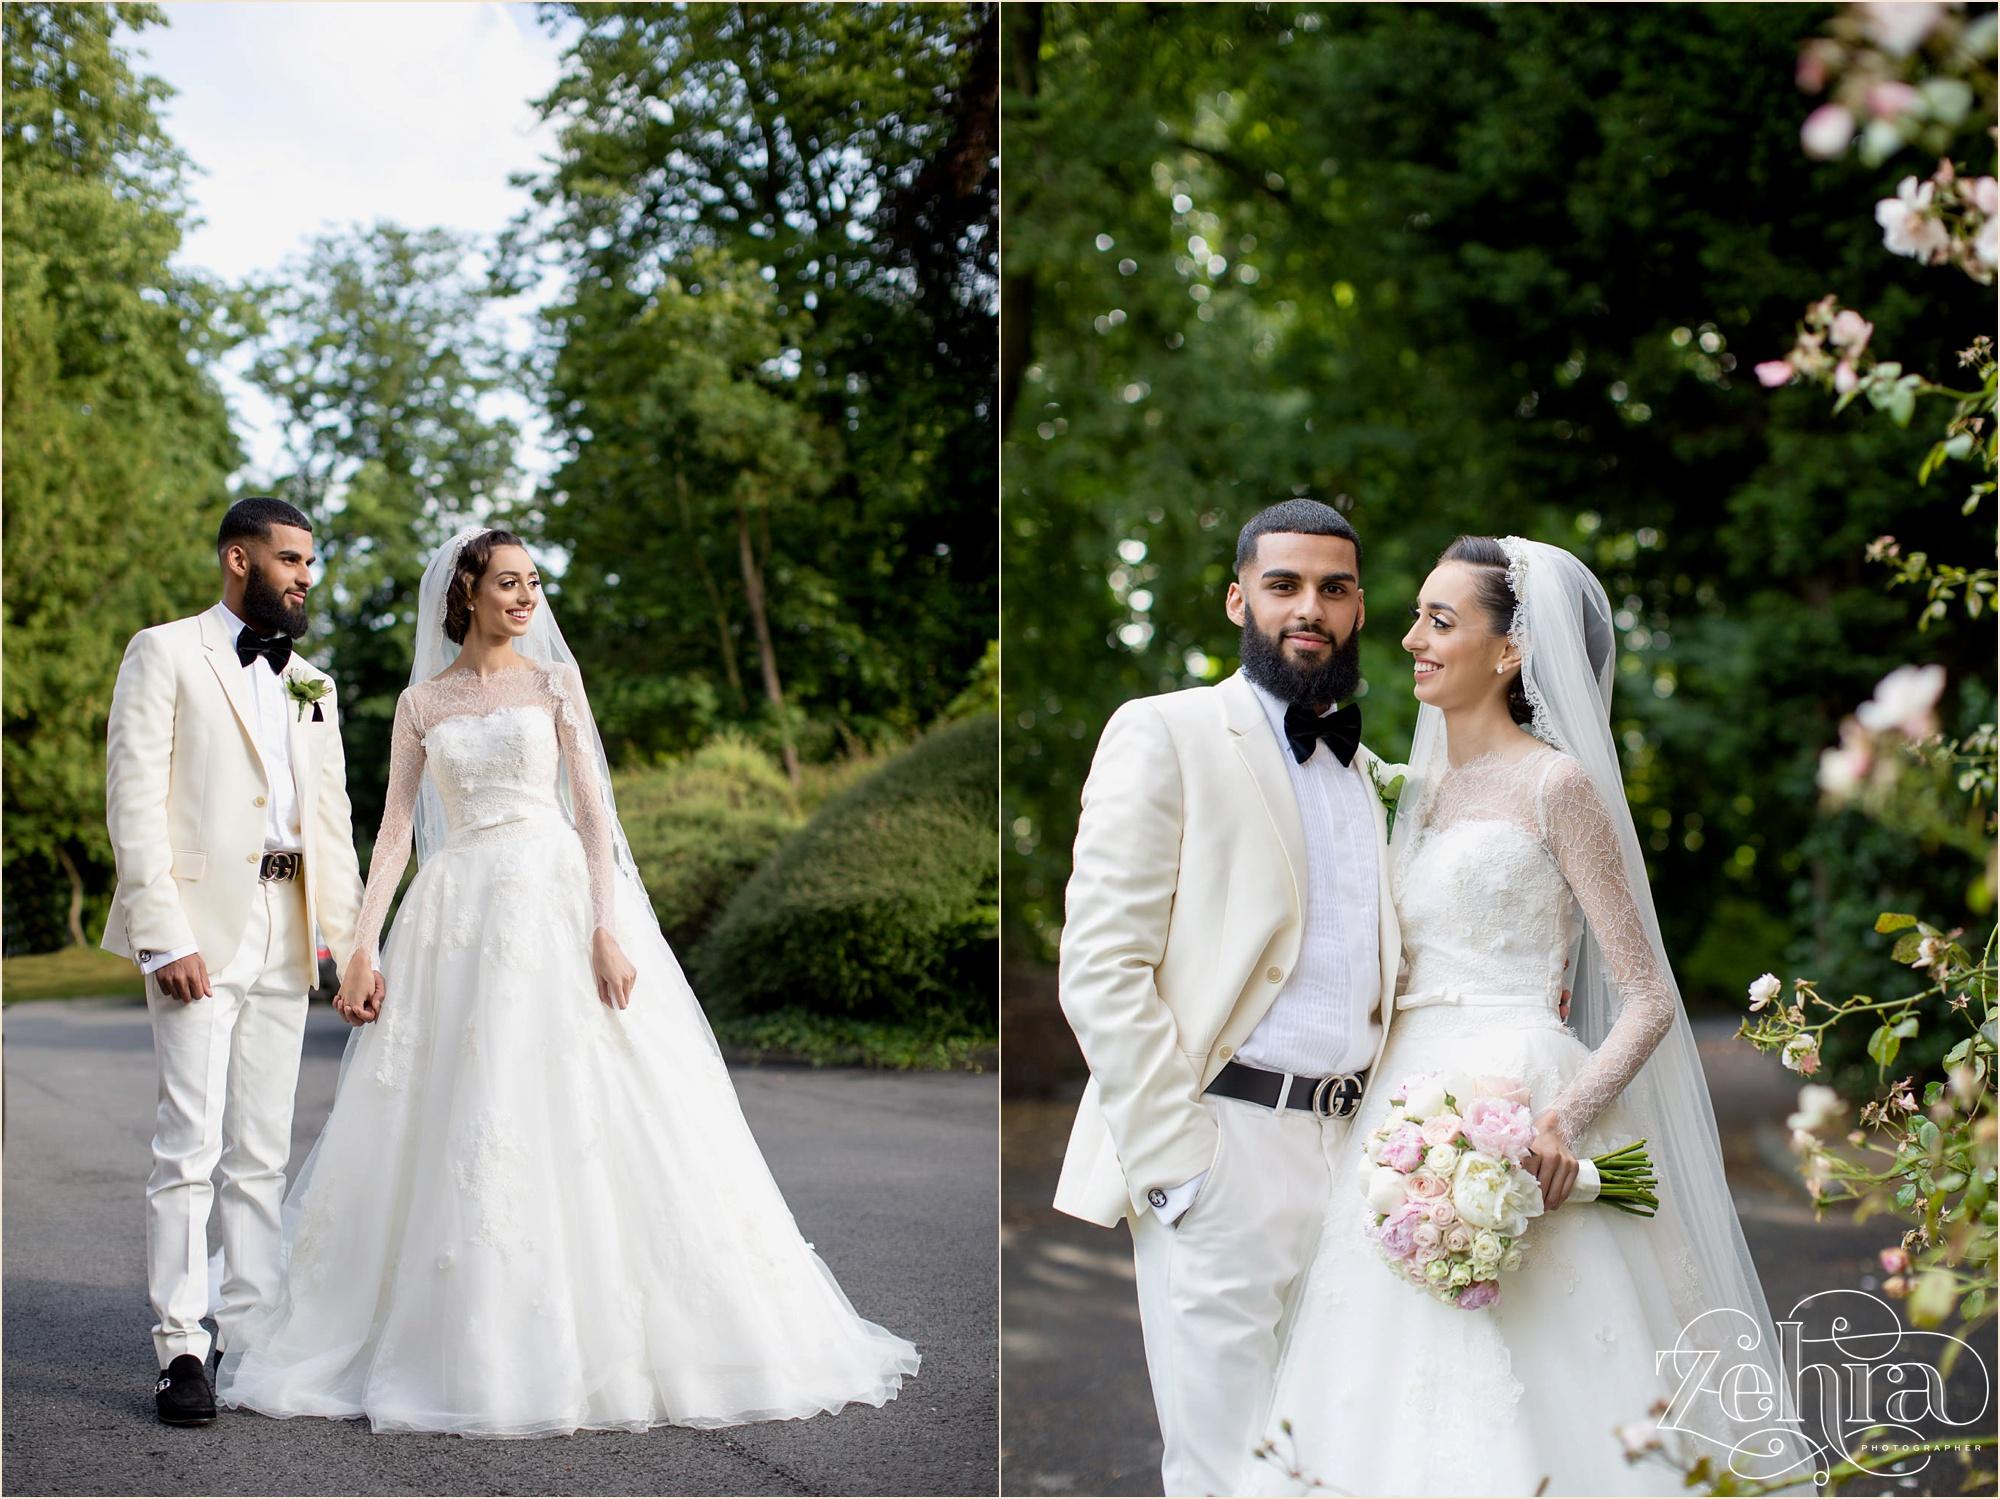 jasira manchester wedding photographer_0024.jpg